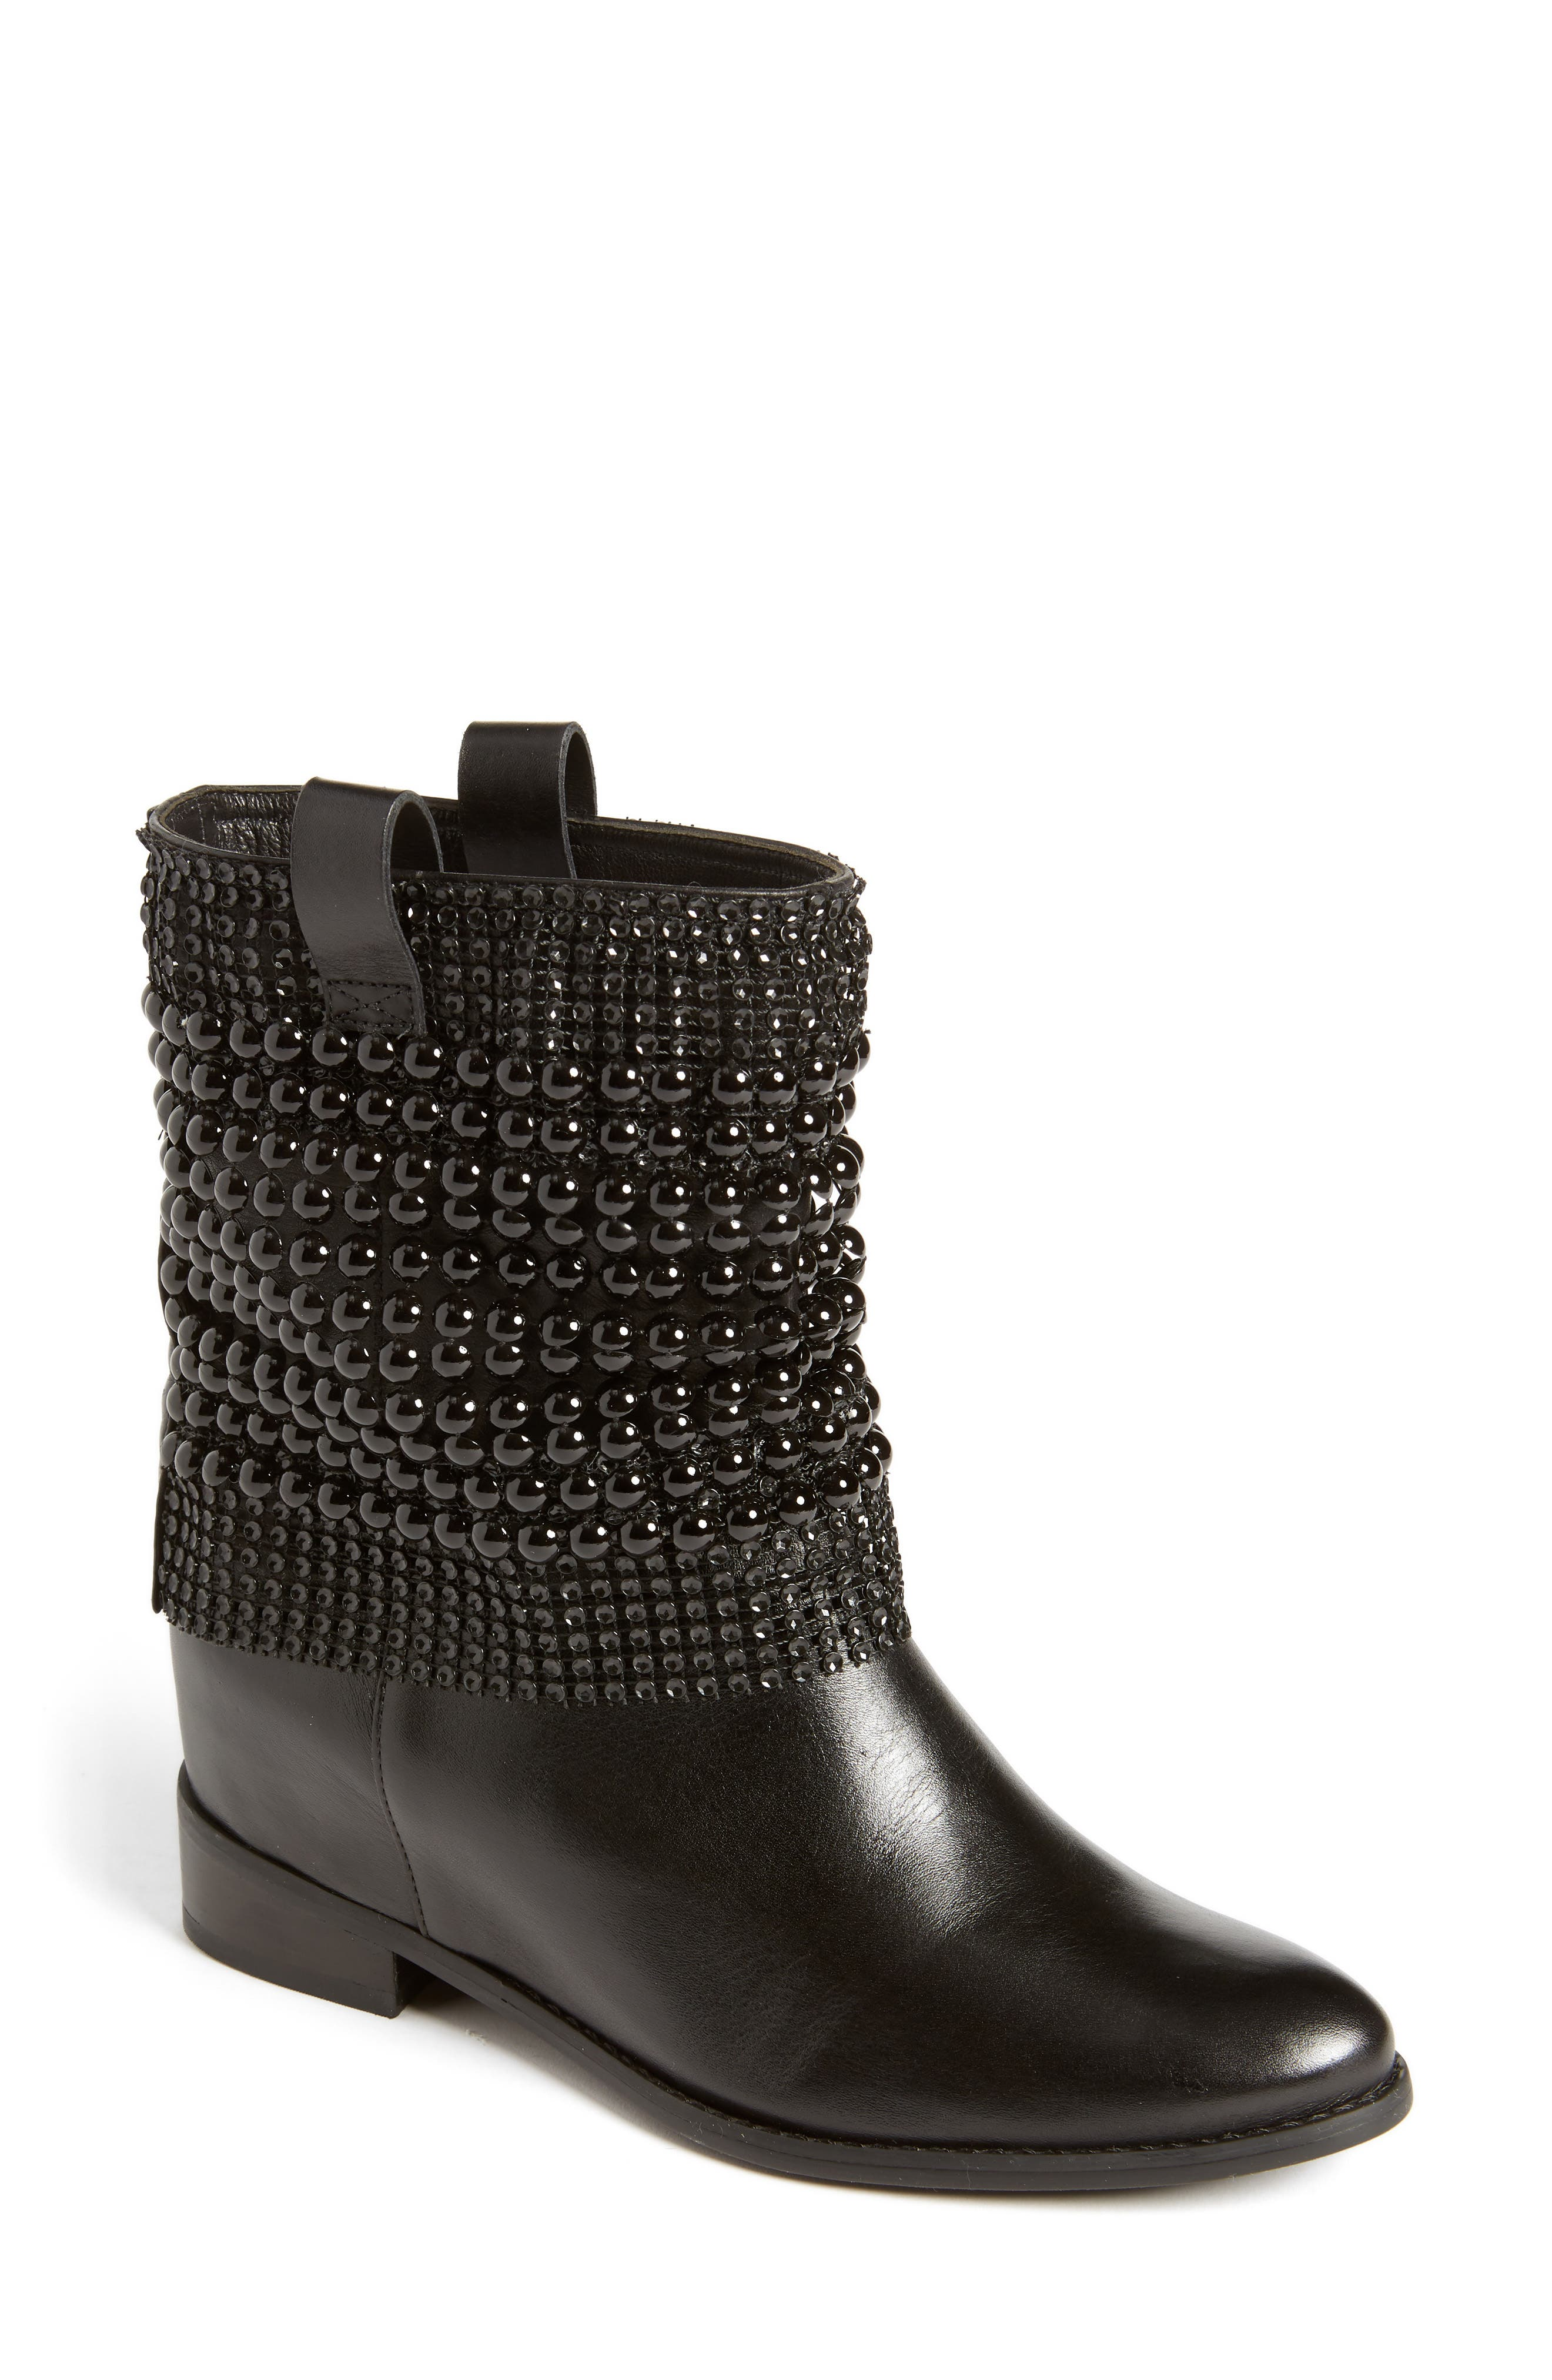 Annik Hidden Wedge Boot,                         Main,                         color, 001